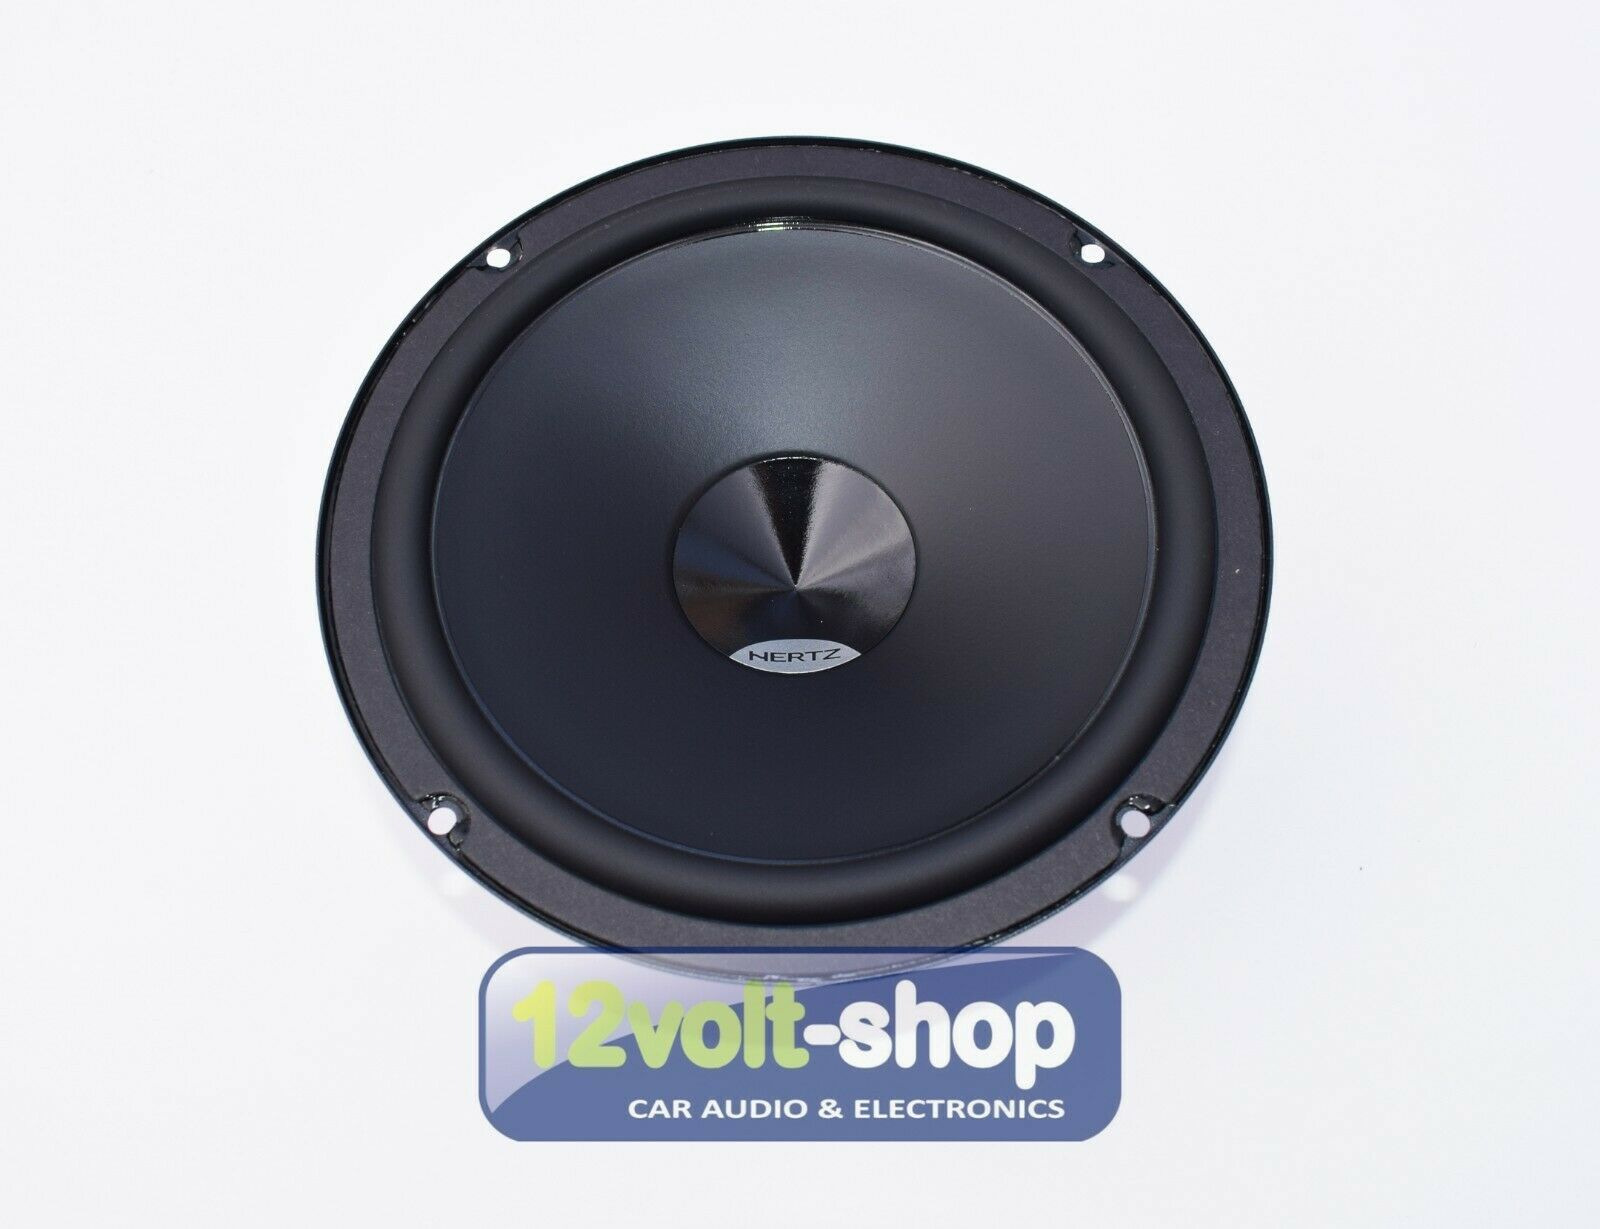 60W 90dB BlackMusic Speakers ULS-165 Altoparlanti coassiali 2 vie 165mm